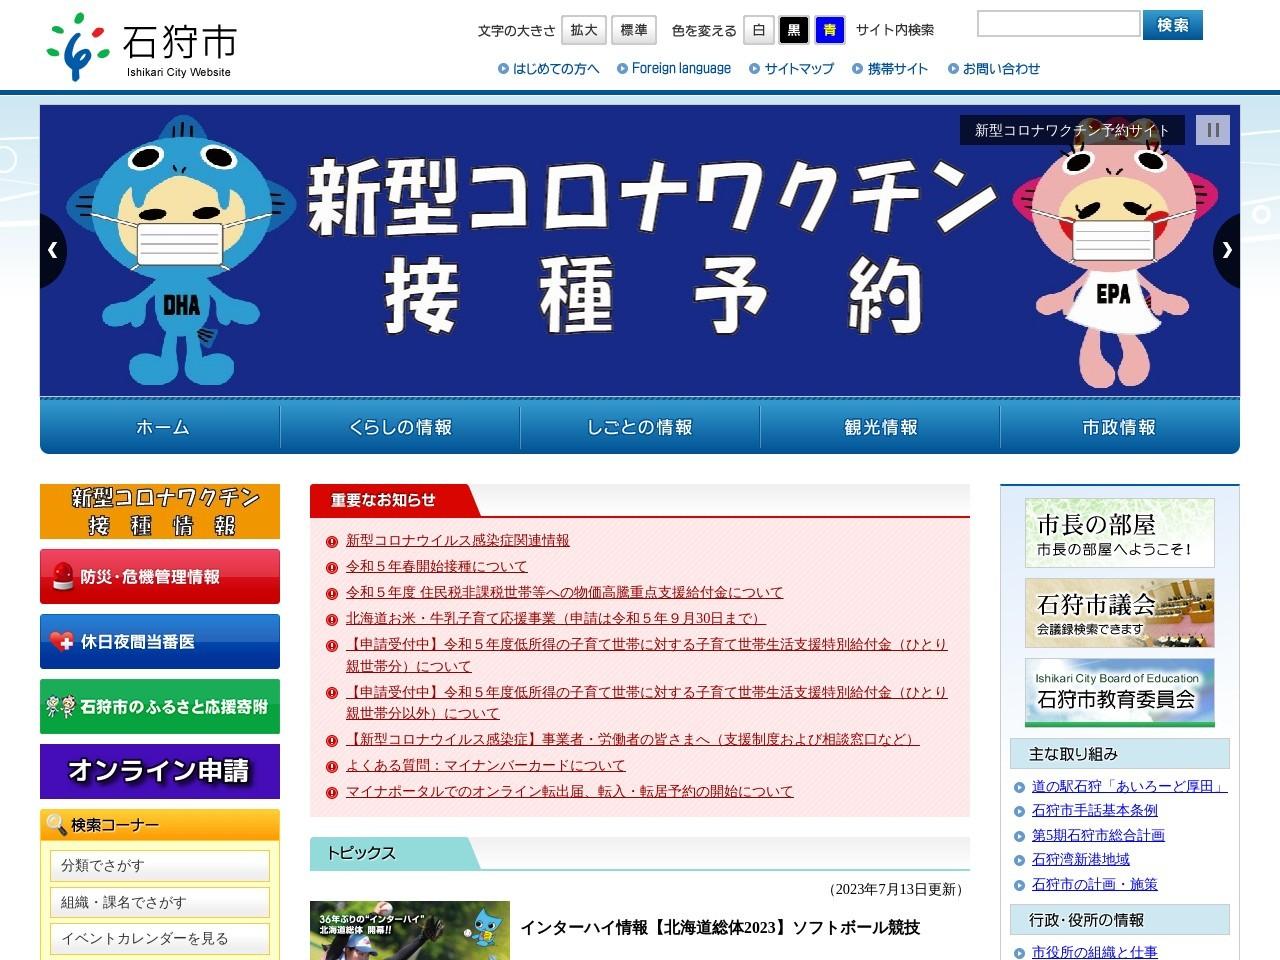 http://www.city.ishikari.hokkaido.jp/soshiki/soumu/36219.html